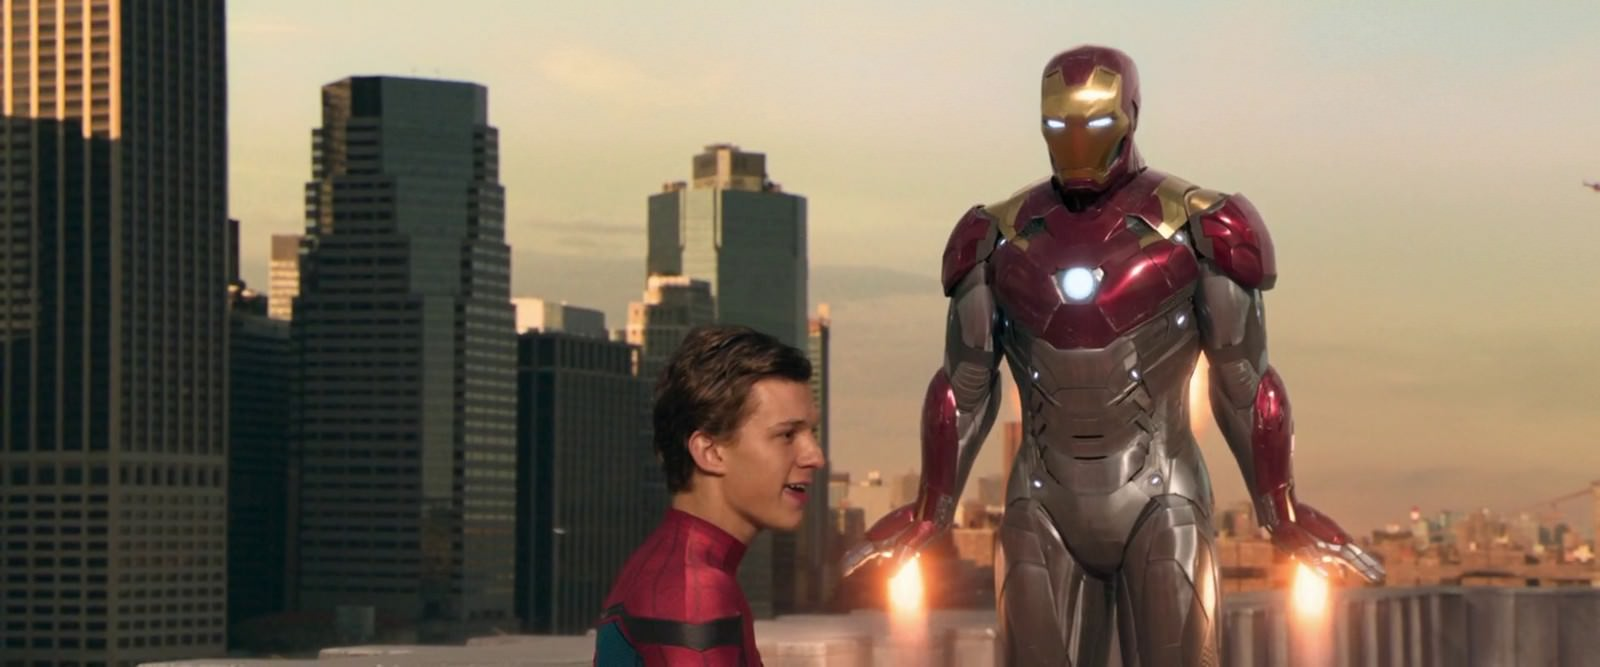 Movie, Spider-Man: Homecoming(美國, 2017年) / 蜘蛛人:返校日(台灣) / 蜘蛛侠:英雄归来(中國) / 蜘蛛俠:強勢回歸(香港), 電影劇照, 鋼鐵人套裝介紹